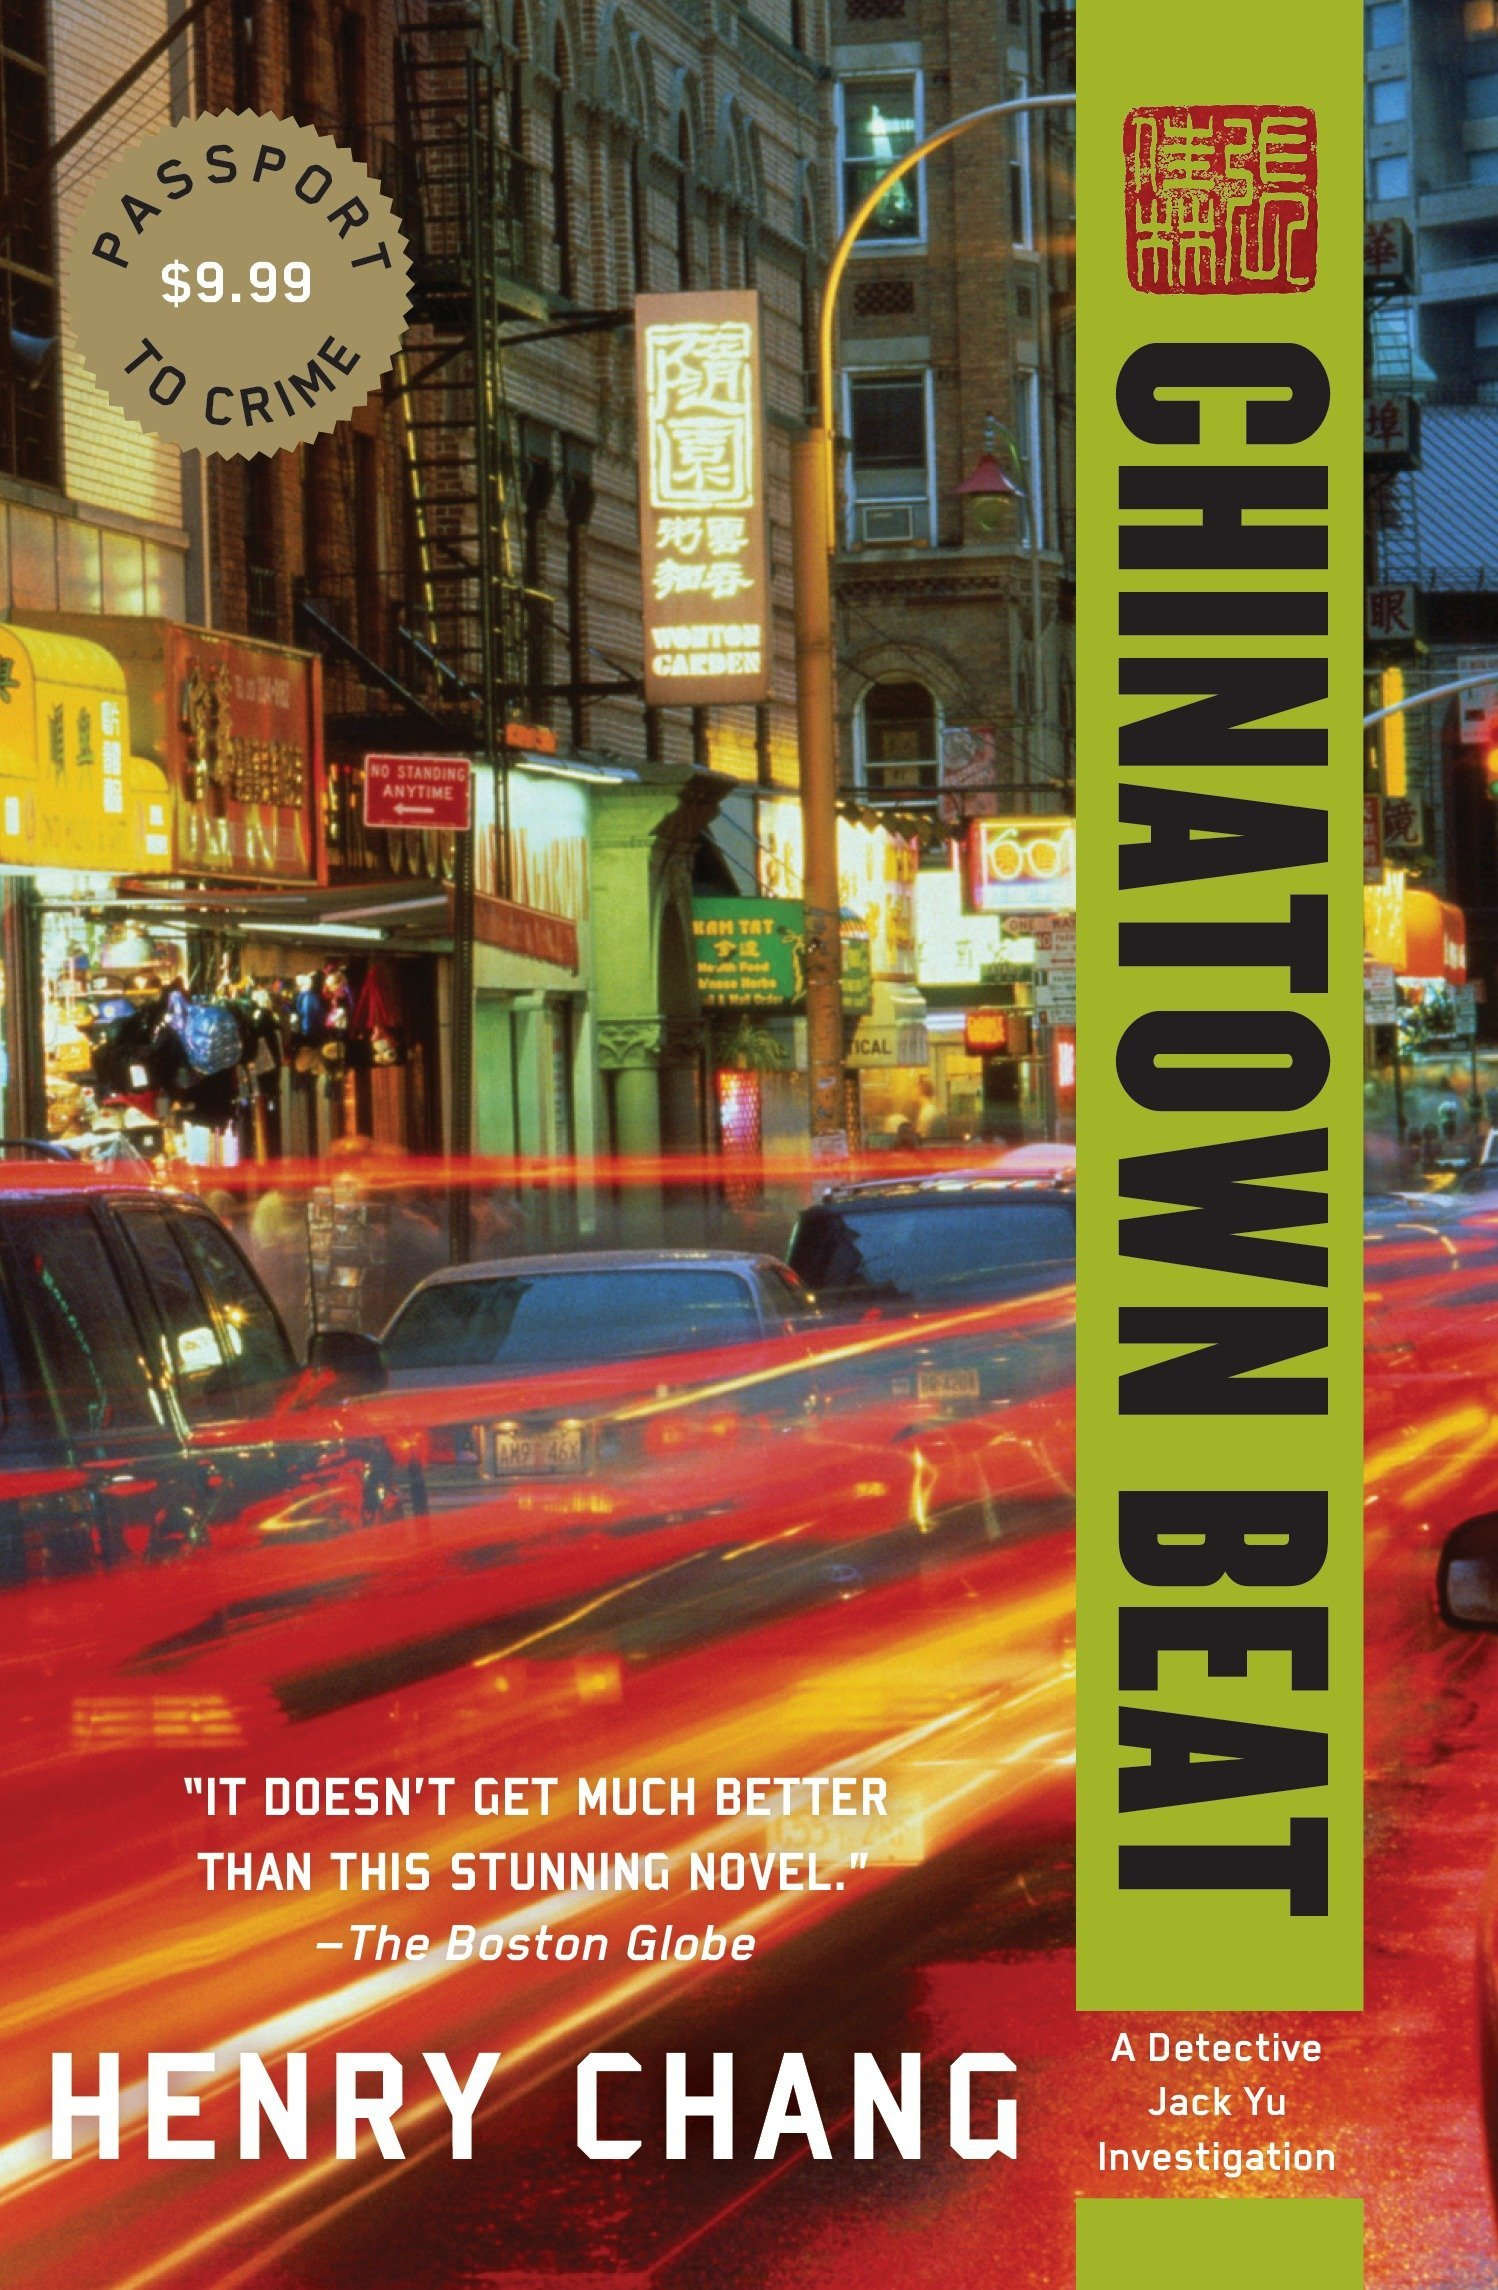 Chinatown Beat (A Detective Jack Yu Investigation) ebook